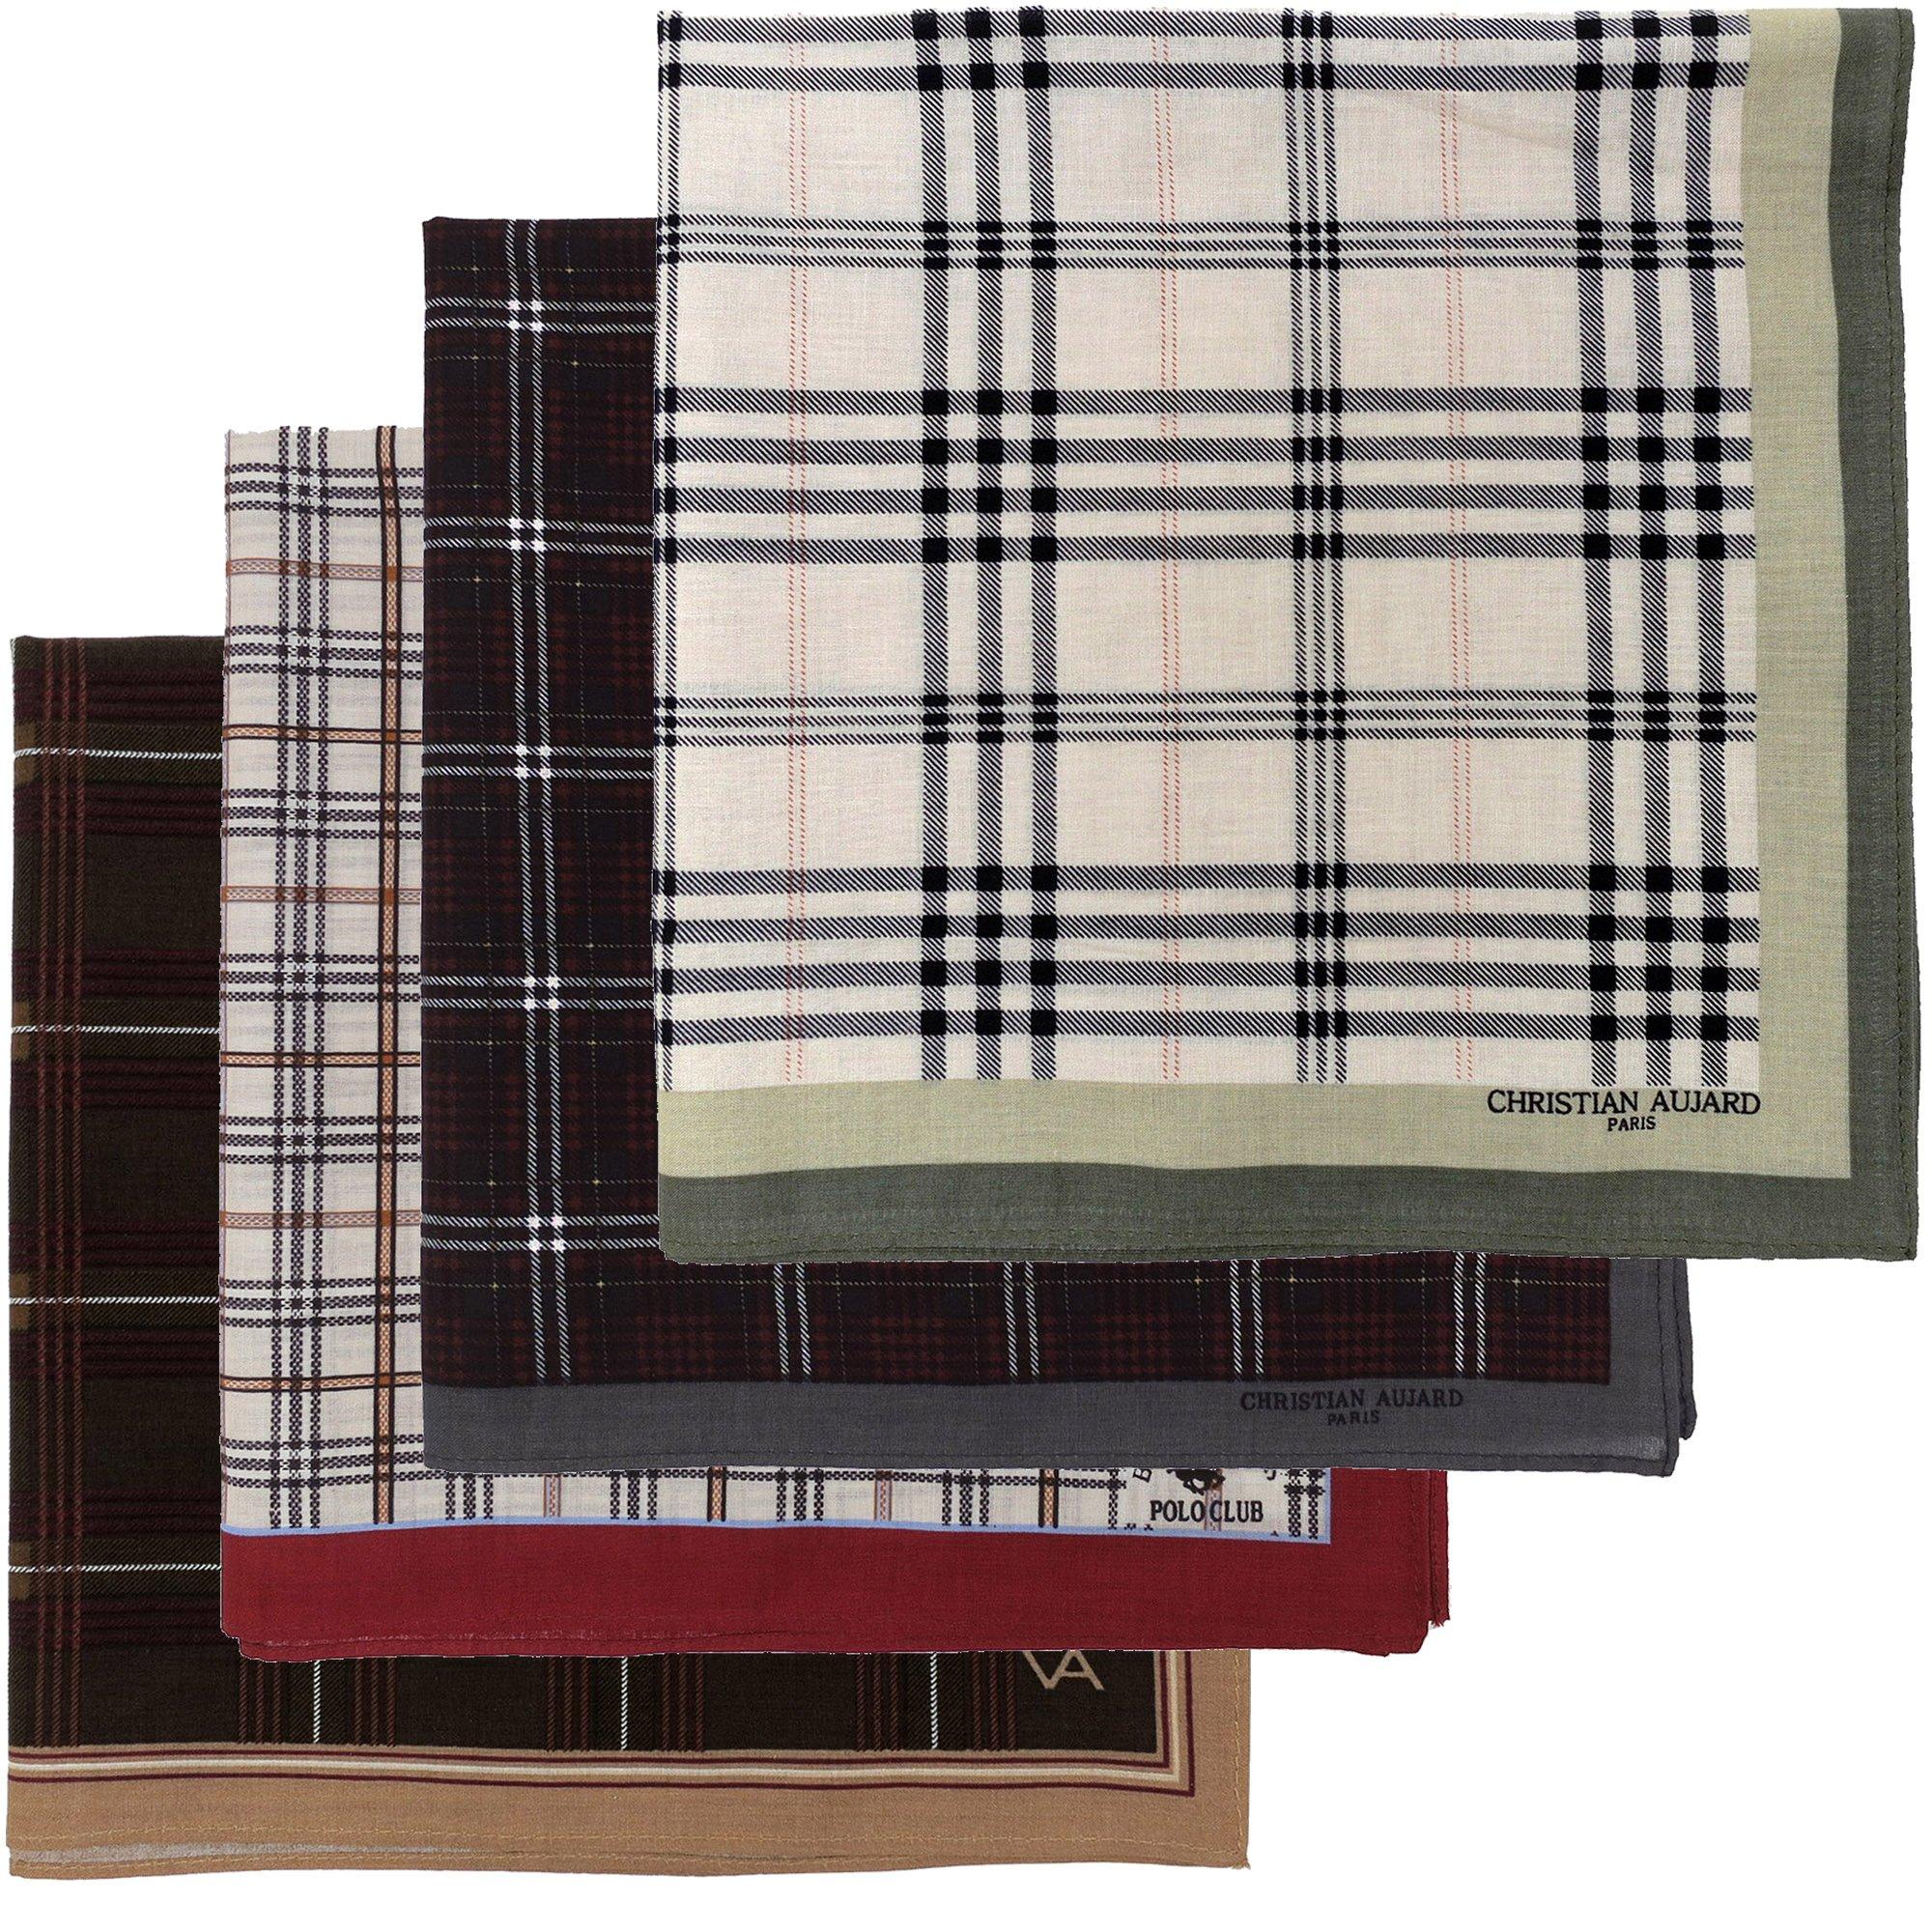 Leevo Handkerchief Men Assorted Woven Cotton 100% Hankies Fashion 4pack OPP Set Assorted (17.5inch No.1~4 Assorted 4pack OPP set)